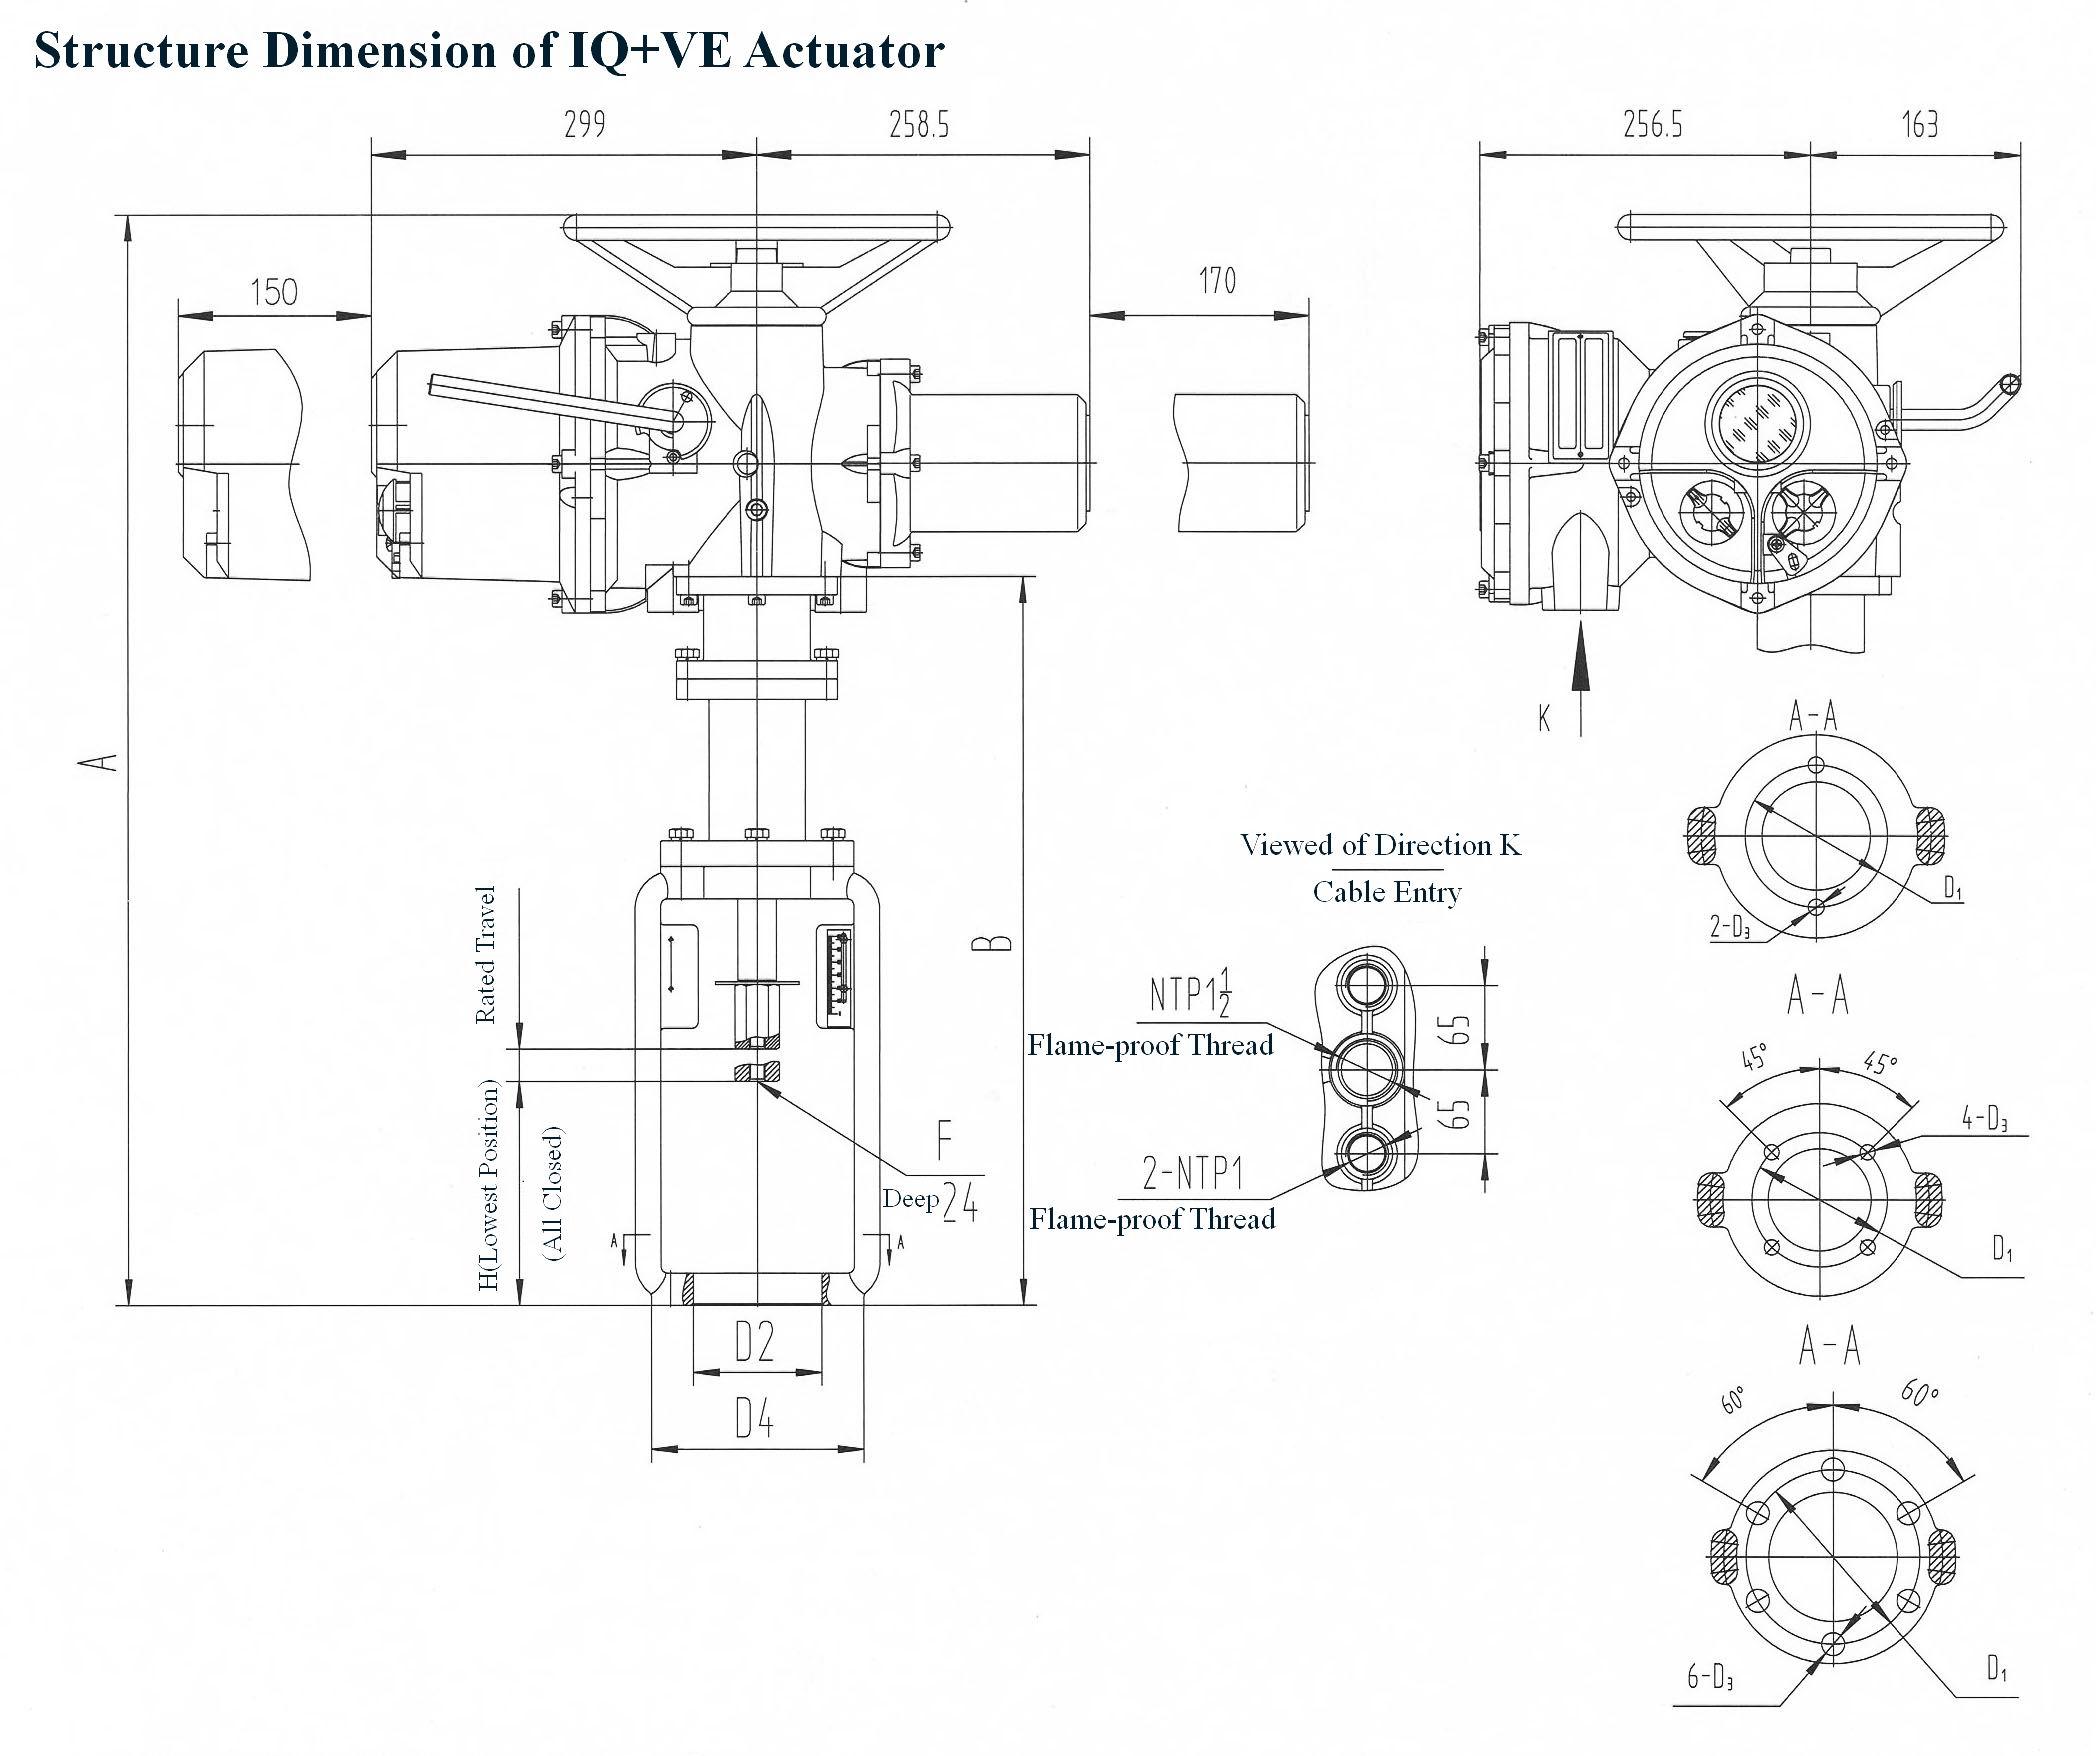 rotork iqt 2000 wiring diagram